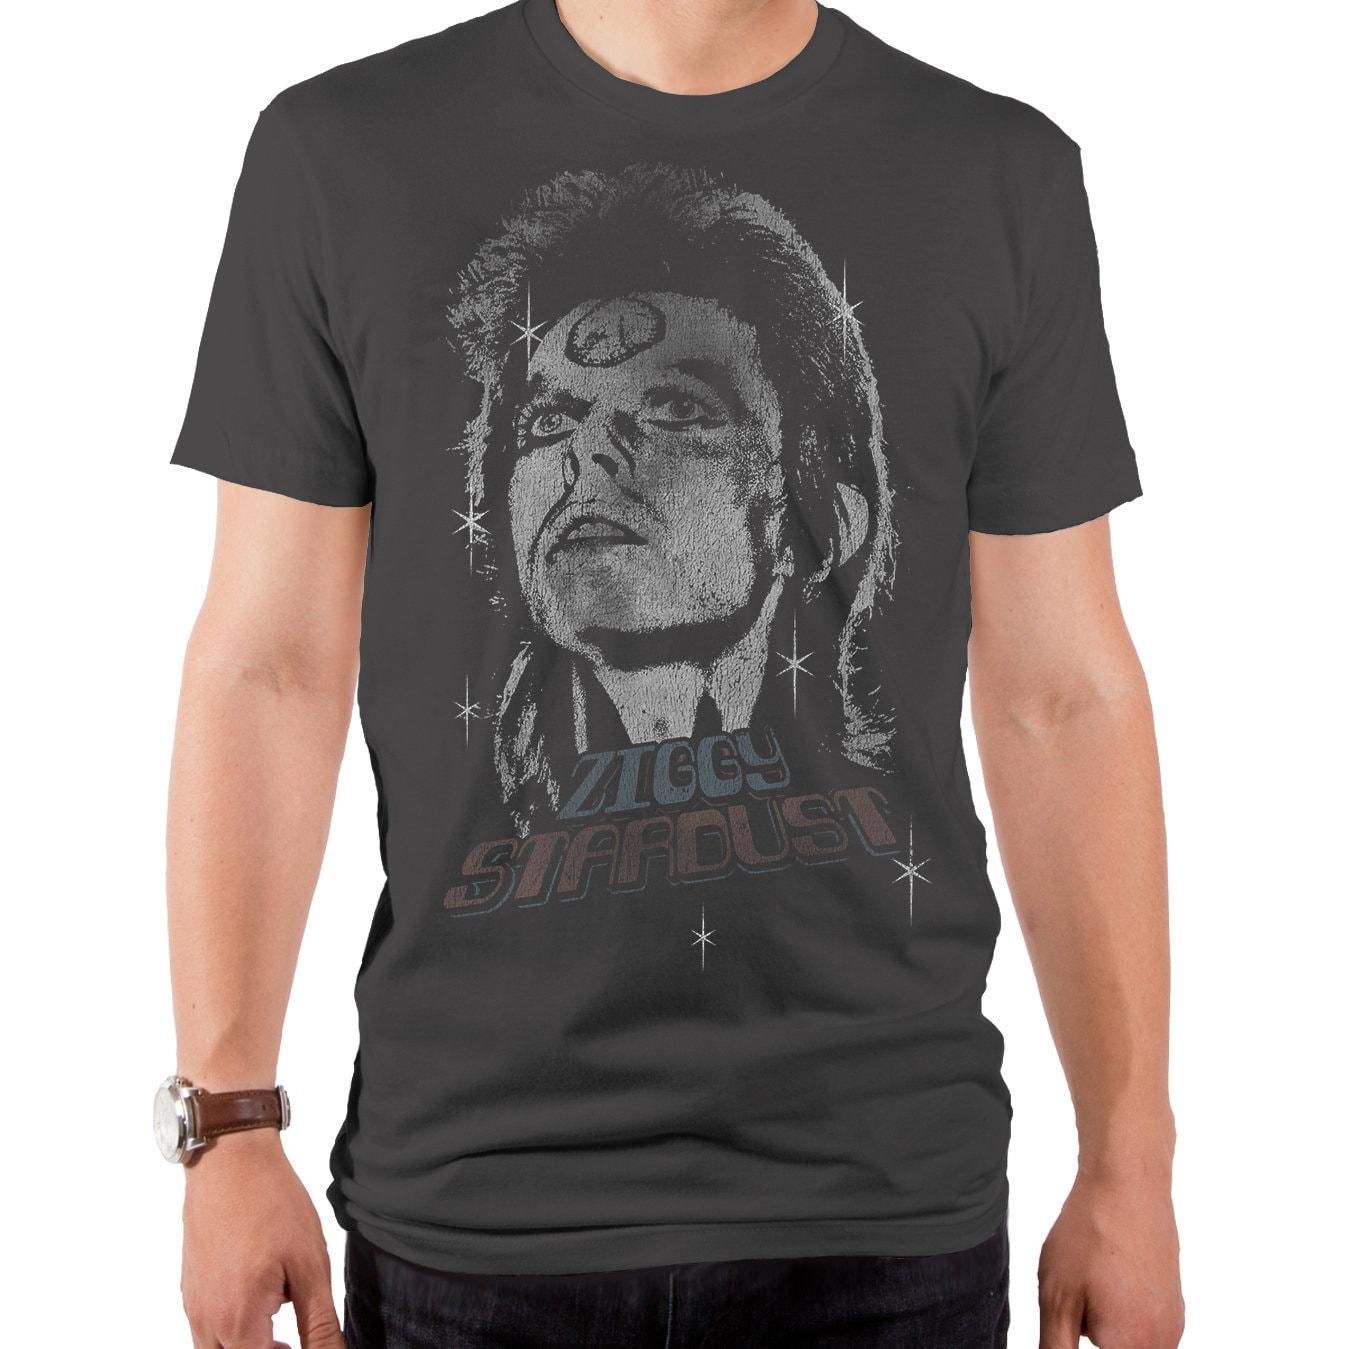 1970s Men's Shirt Styles – Vintage 70s Shirts for Guys David Bowie Ziggy Vintage Mens T-Shirt  Bwe0384-101Hmt Stardust, Reflect, Vision, 1980S, Lets Dance, 1970S, English Singer, Music $13.97 AT vintagedancer.com